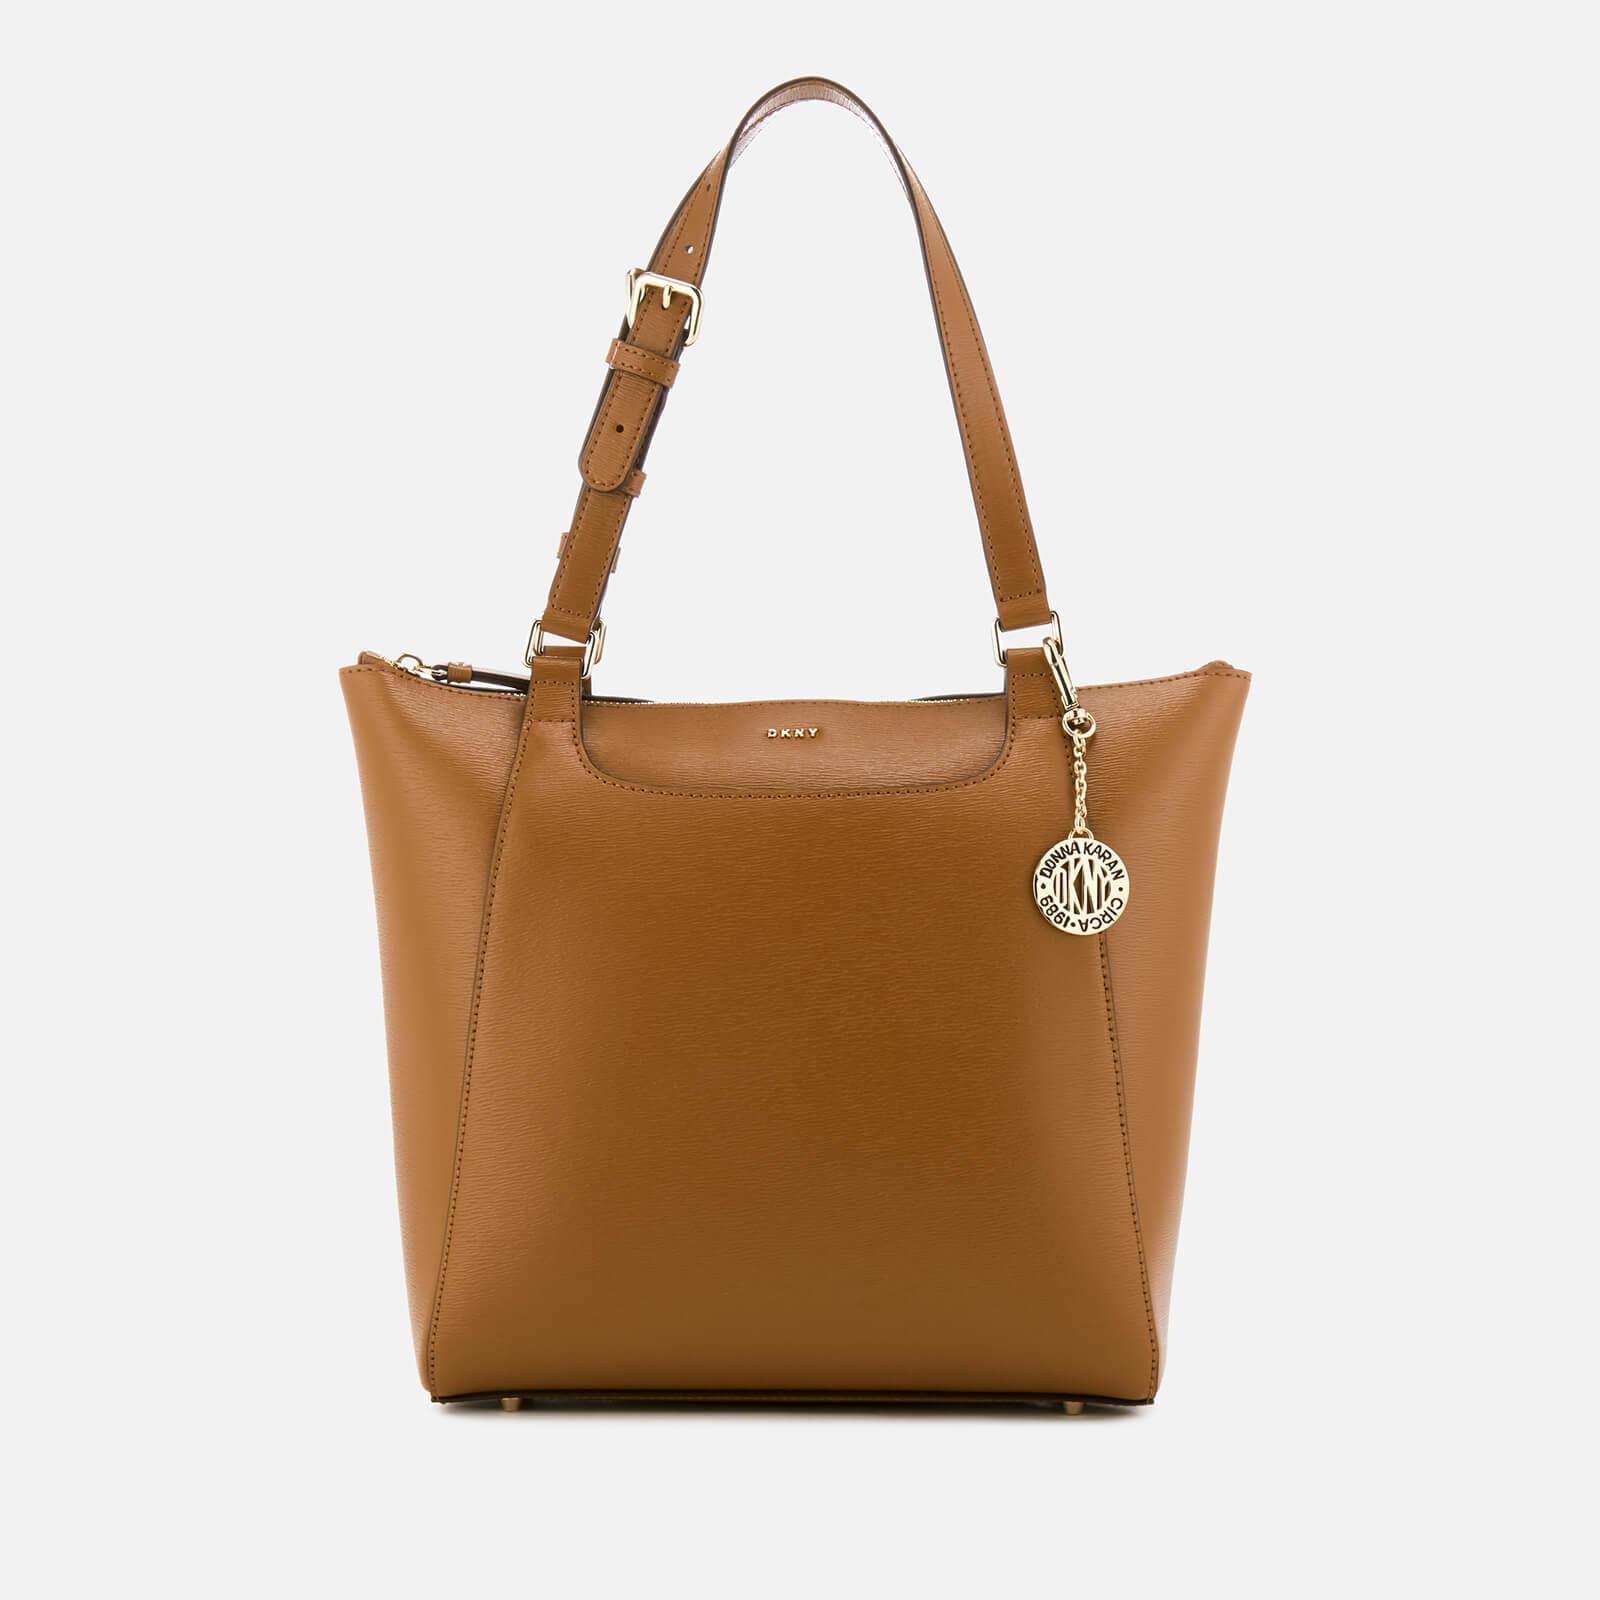 DKNY Leather Sutton Saddle Medium Tote Bag